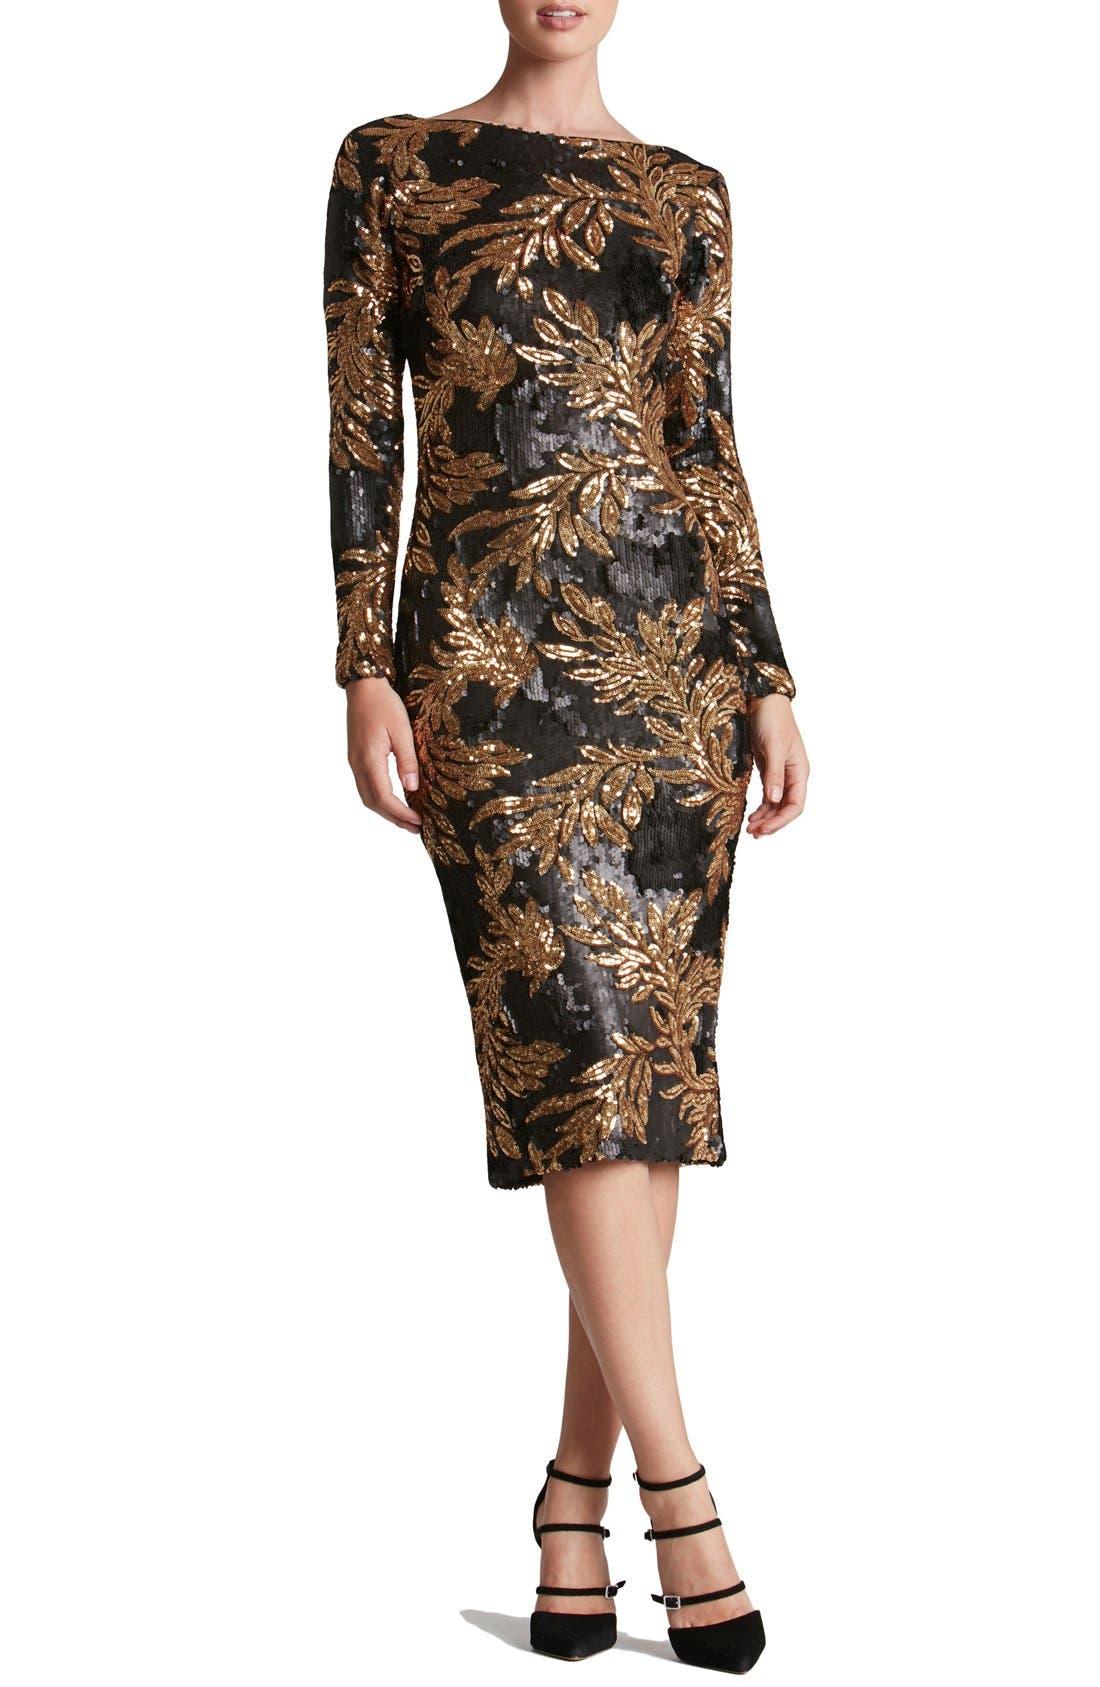 Main Image - Dress the Population 'Emery' Scoop Back Two-Tone Sequin Sheath Dress